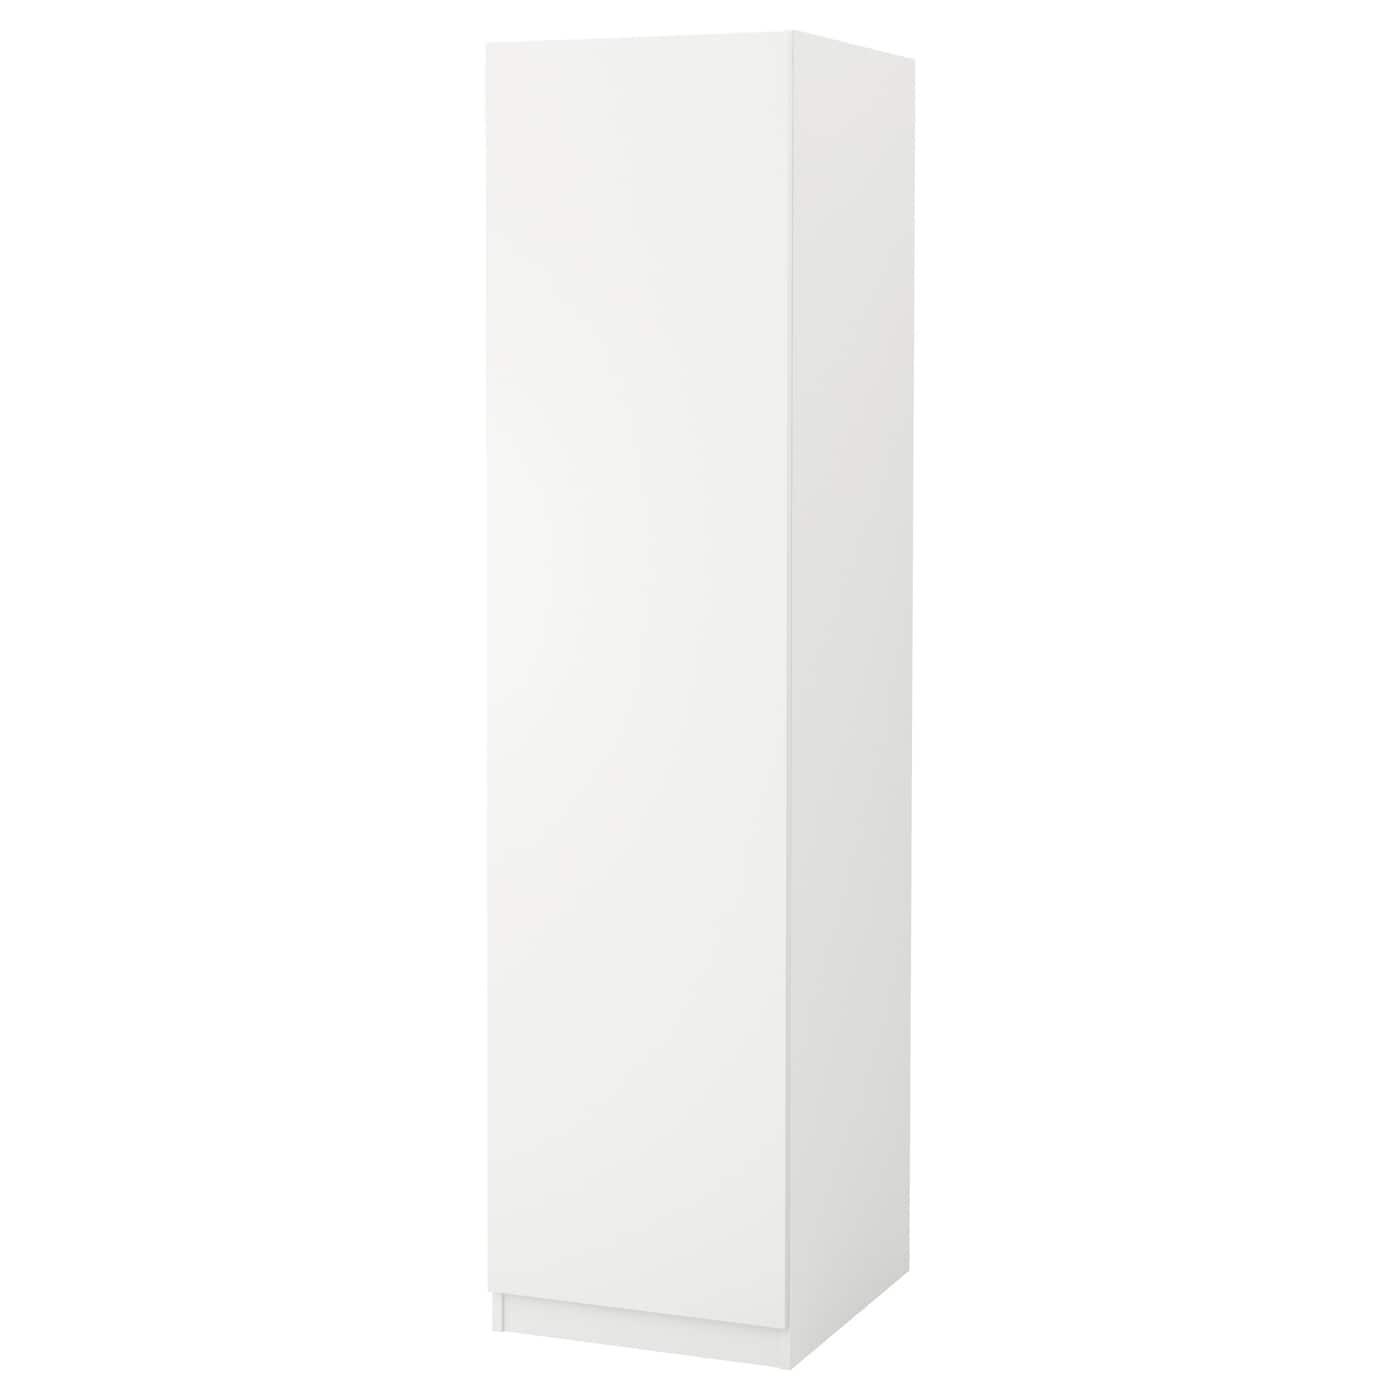 pax wardrobe white tanem white 50x60x201 cm ikea. Black Bedroom Furniture Sets. Home Design Ideas